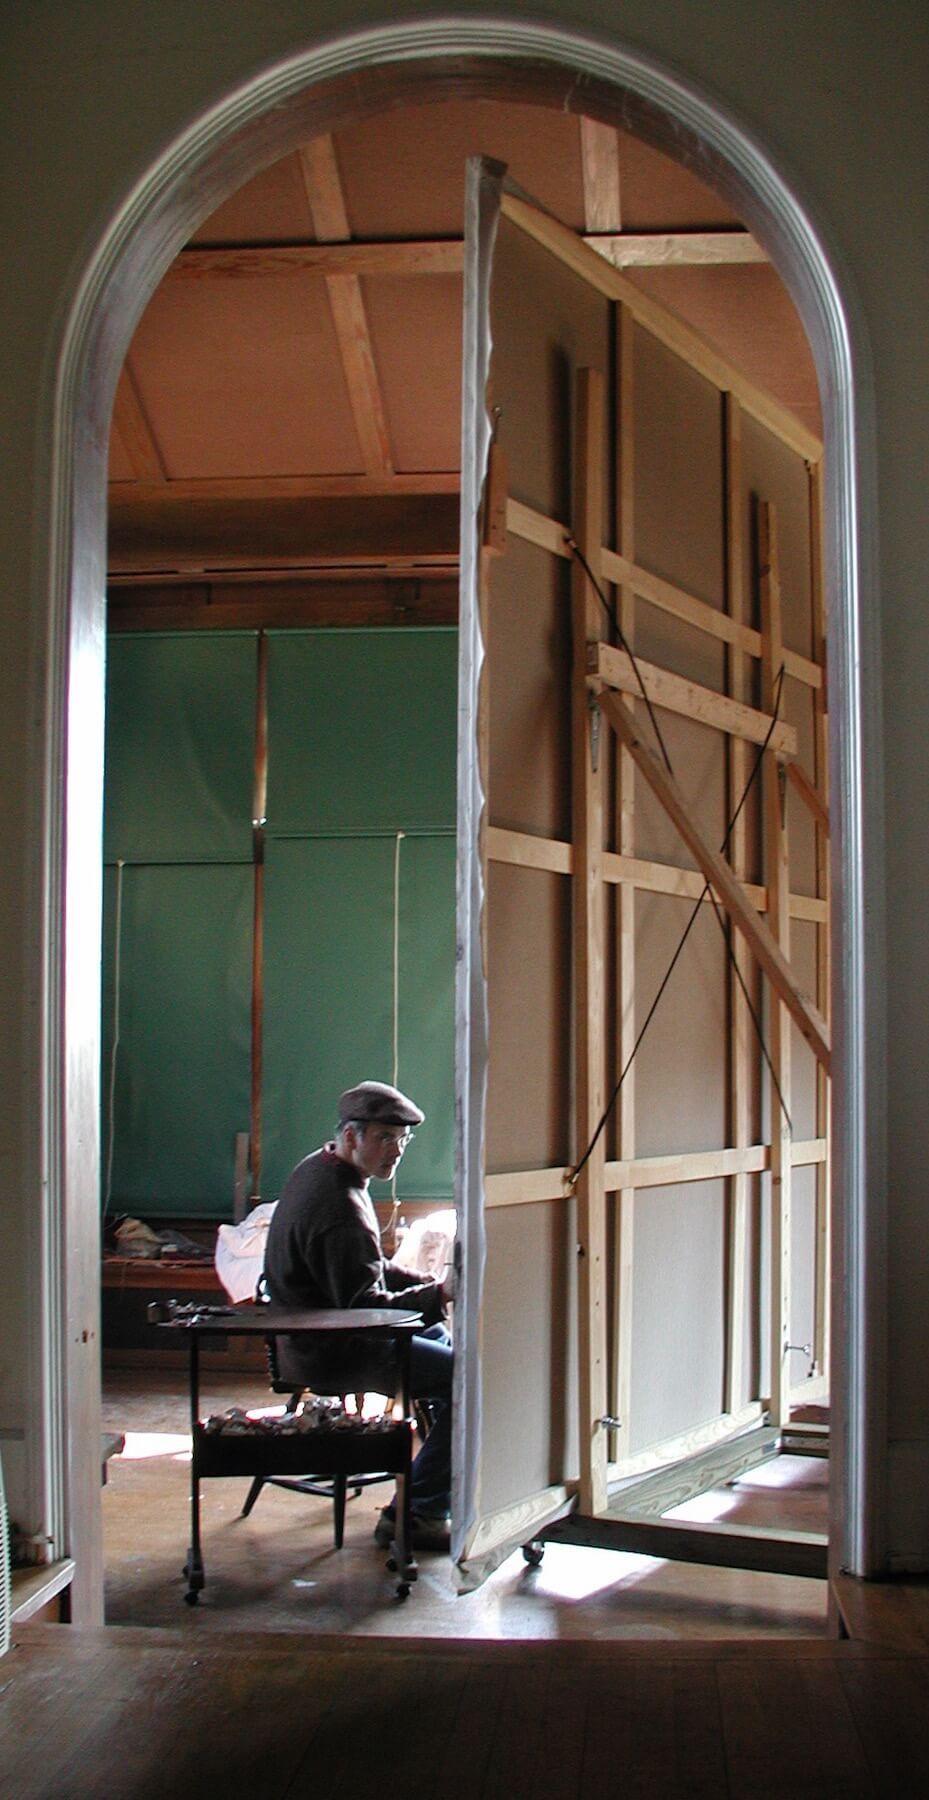 Carl Samson with large multifigural painting in art studio